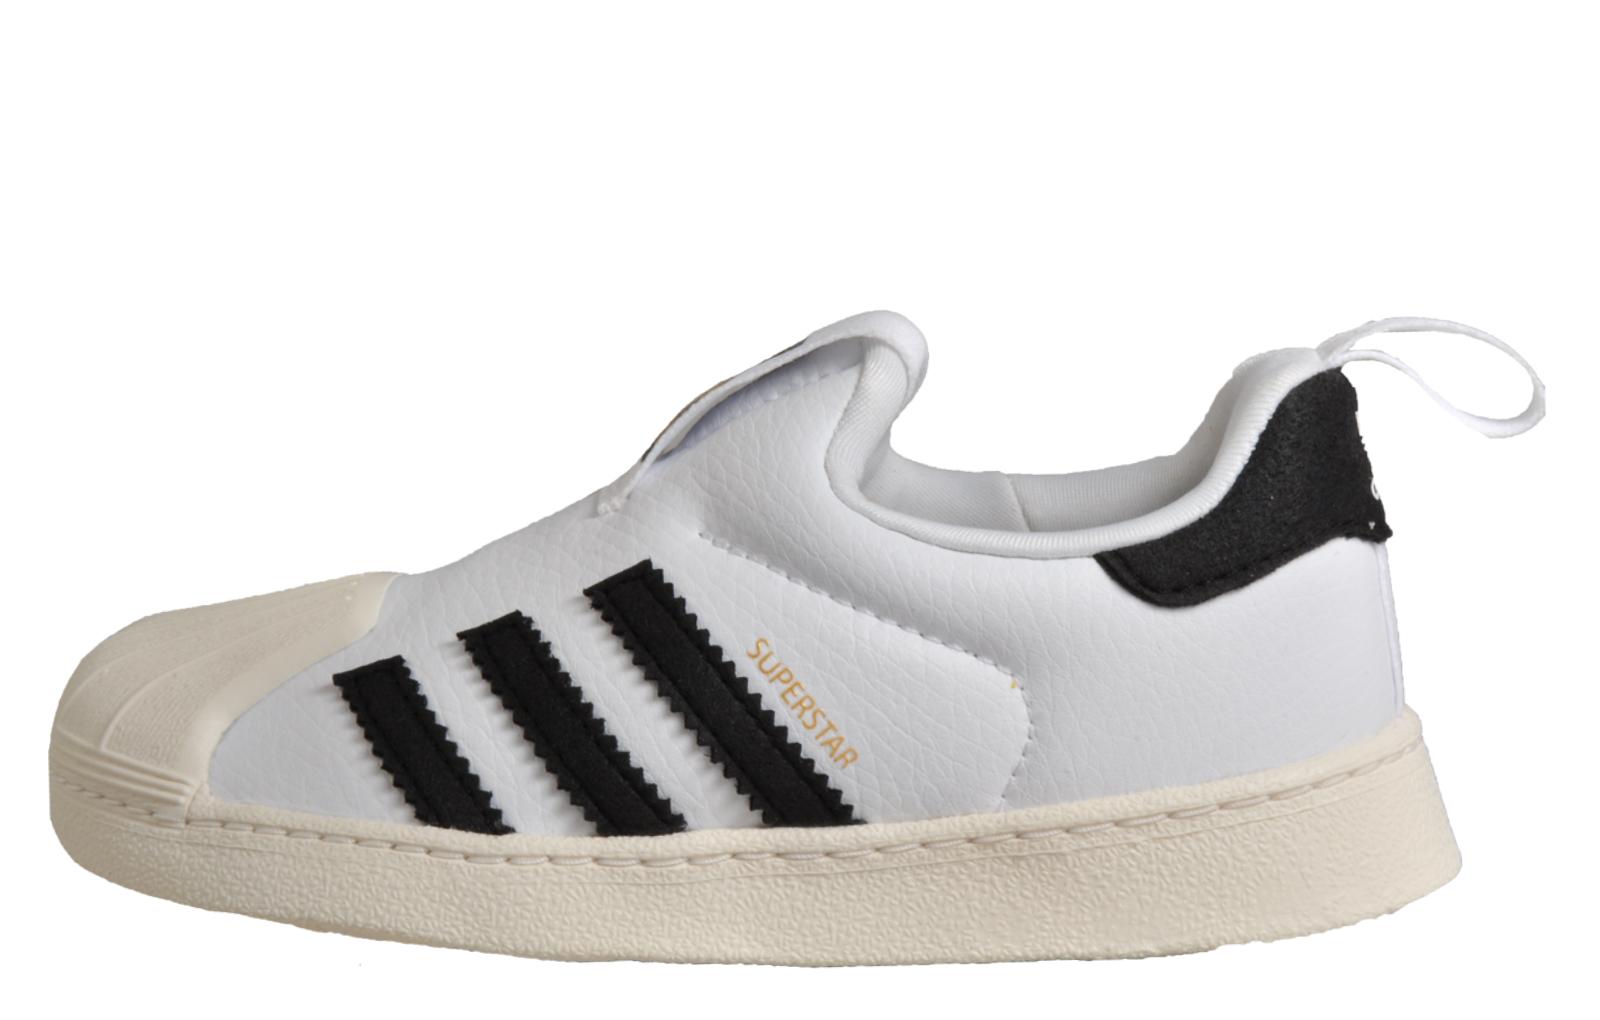 Adidas Originals Superstar 360 Infants - AD169243 33cf0ebf5